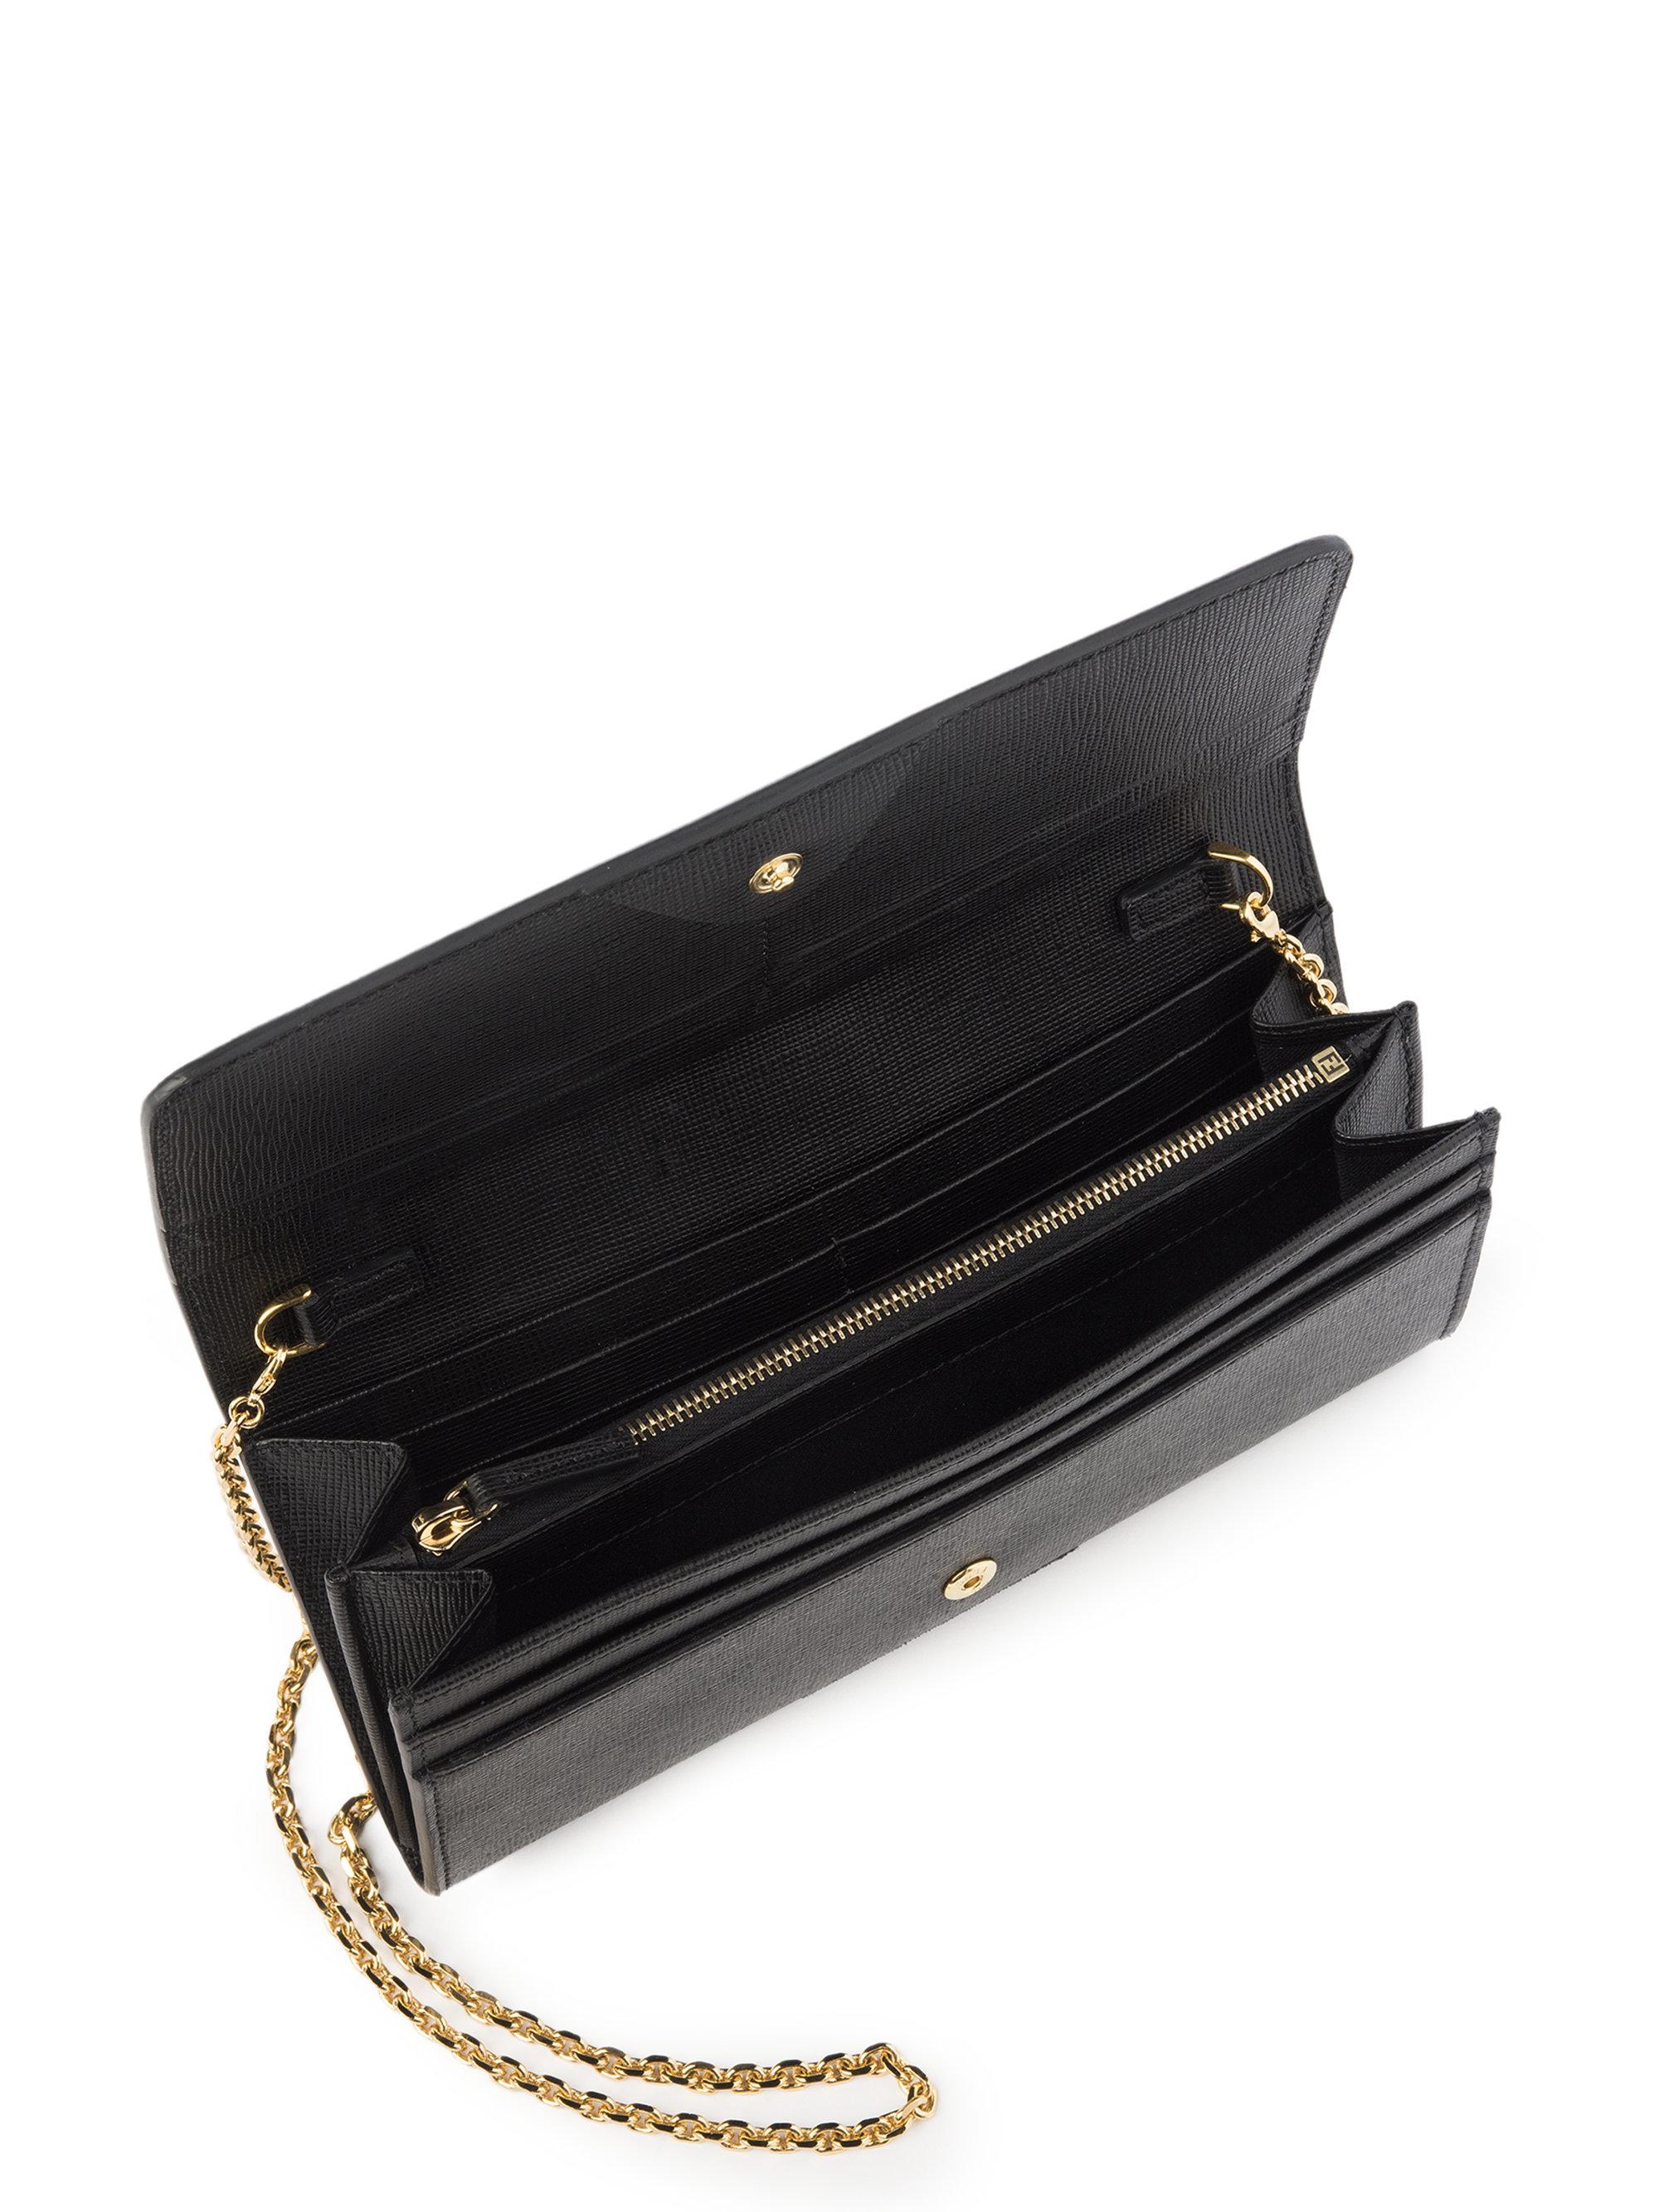 82df979103 Lyst - Fendi Monster Leather Chain Wallet in Black